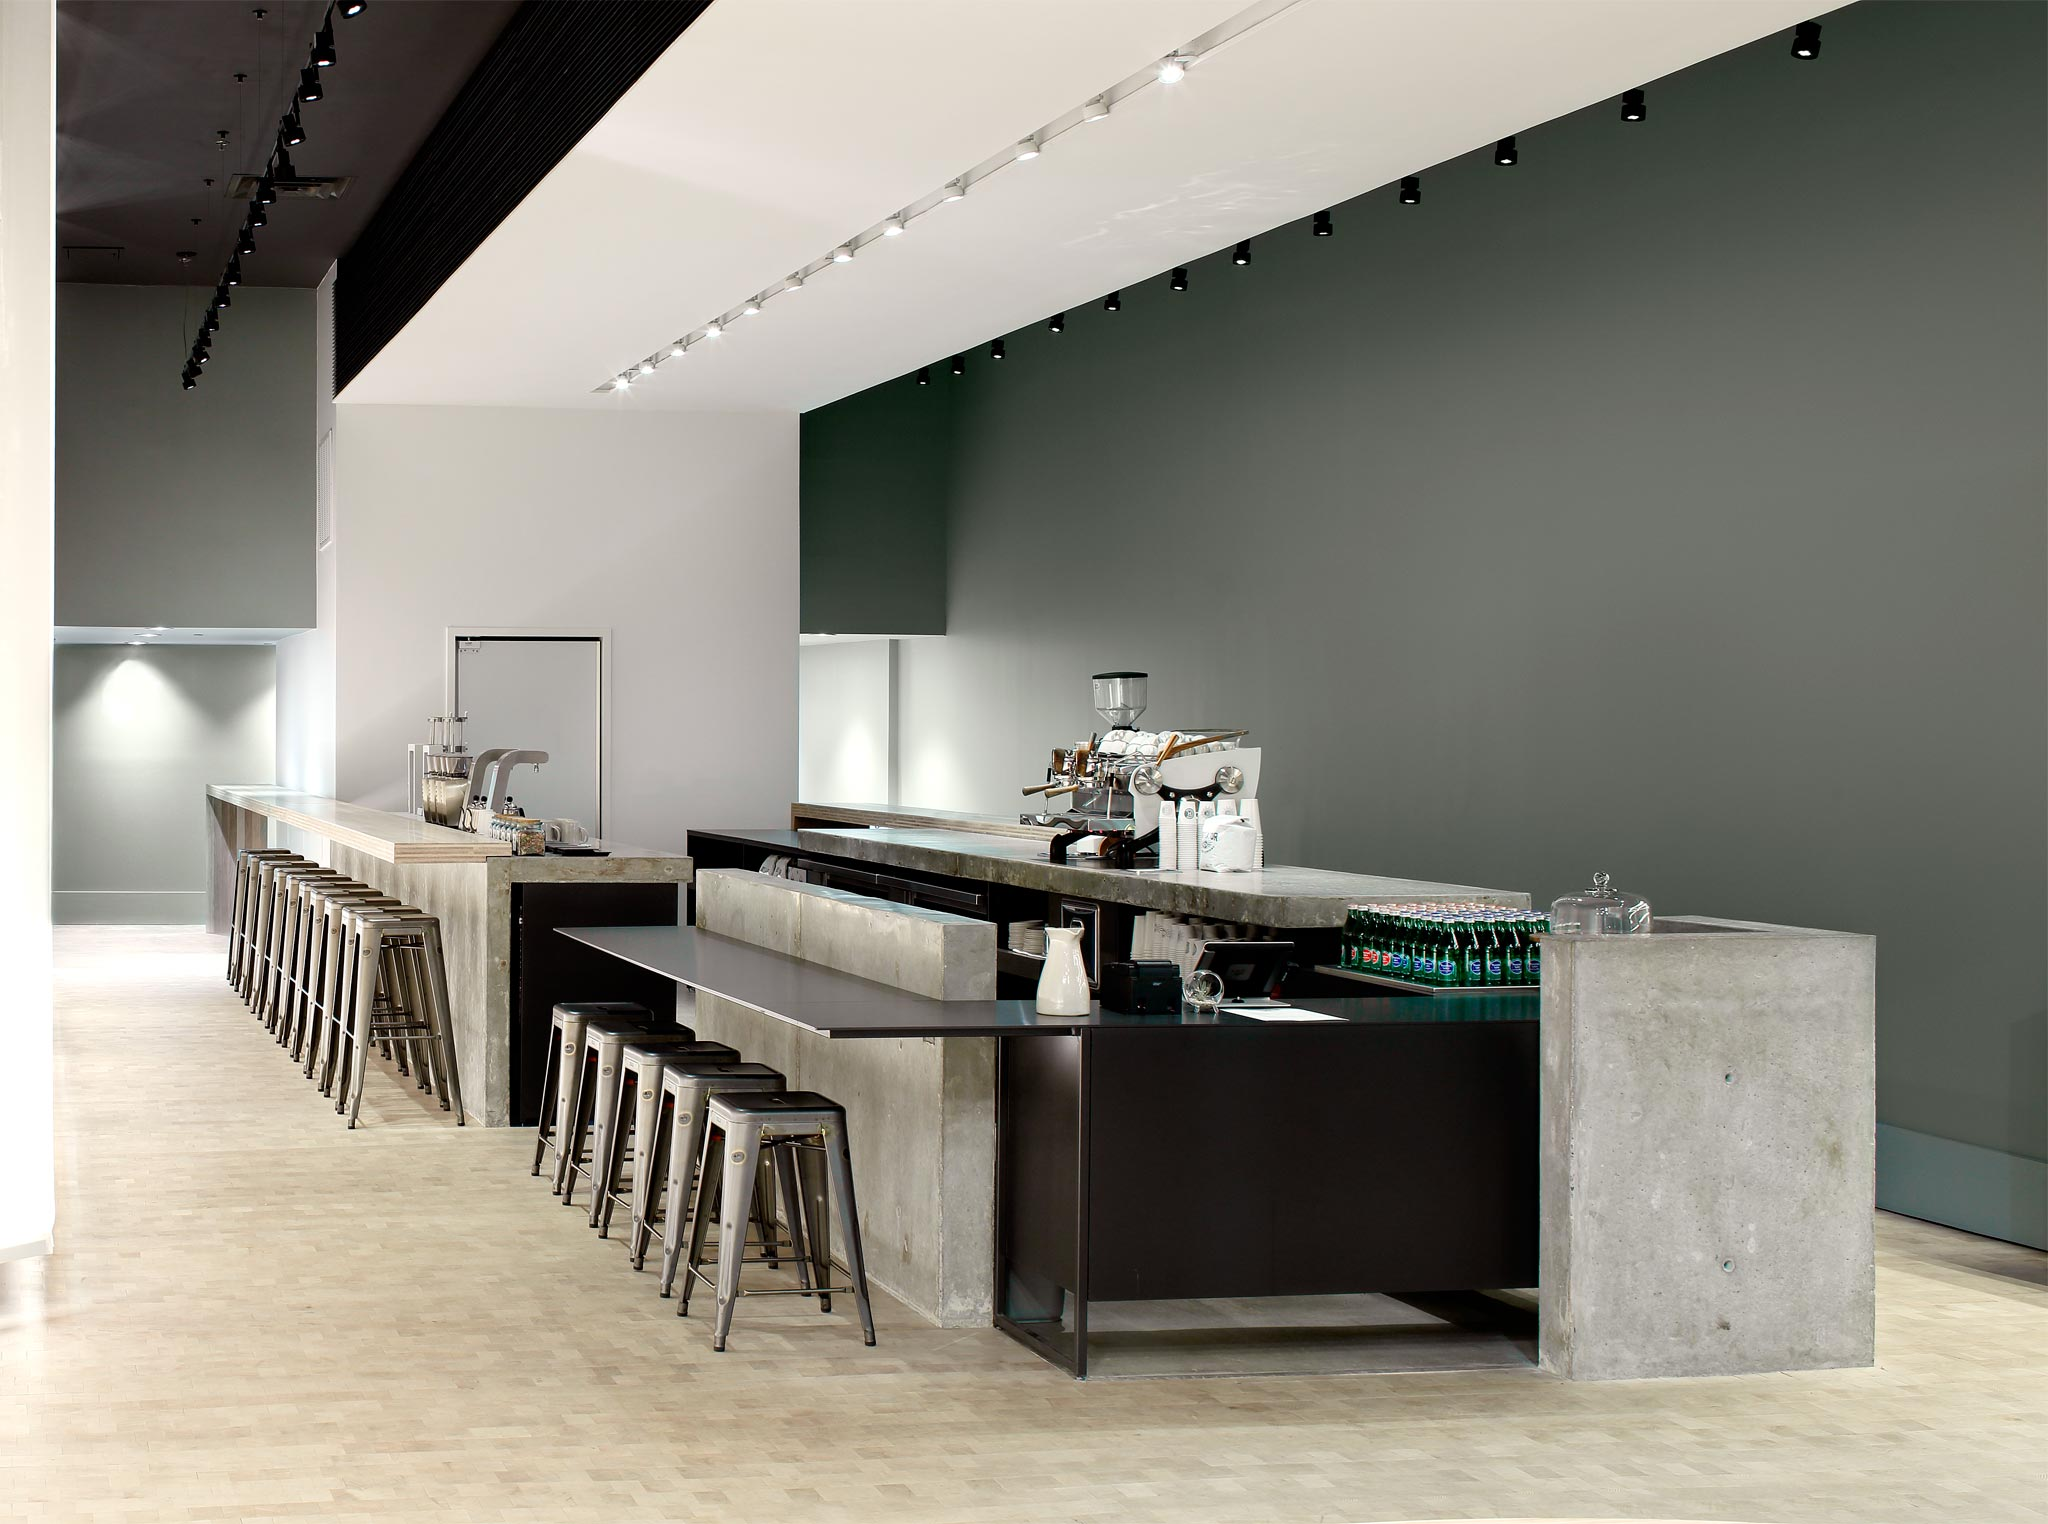 Revelator Birmingham modern coffee shop inside shot of empty coffee shop